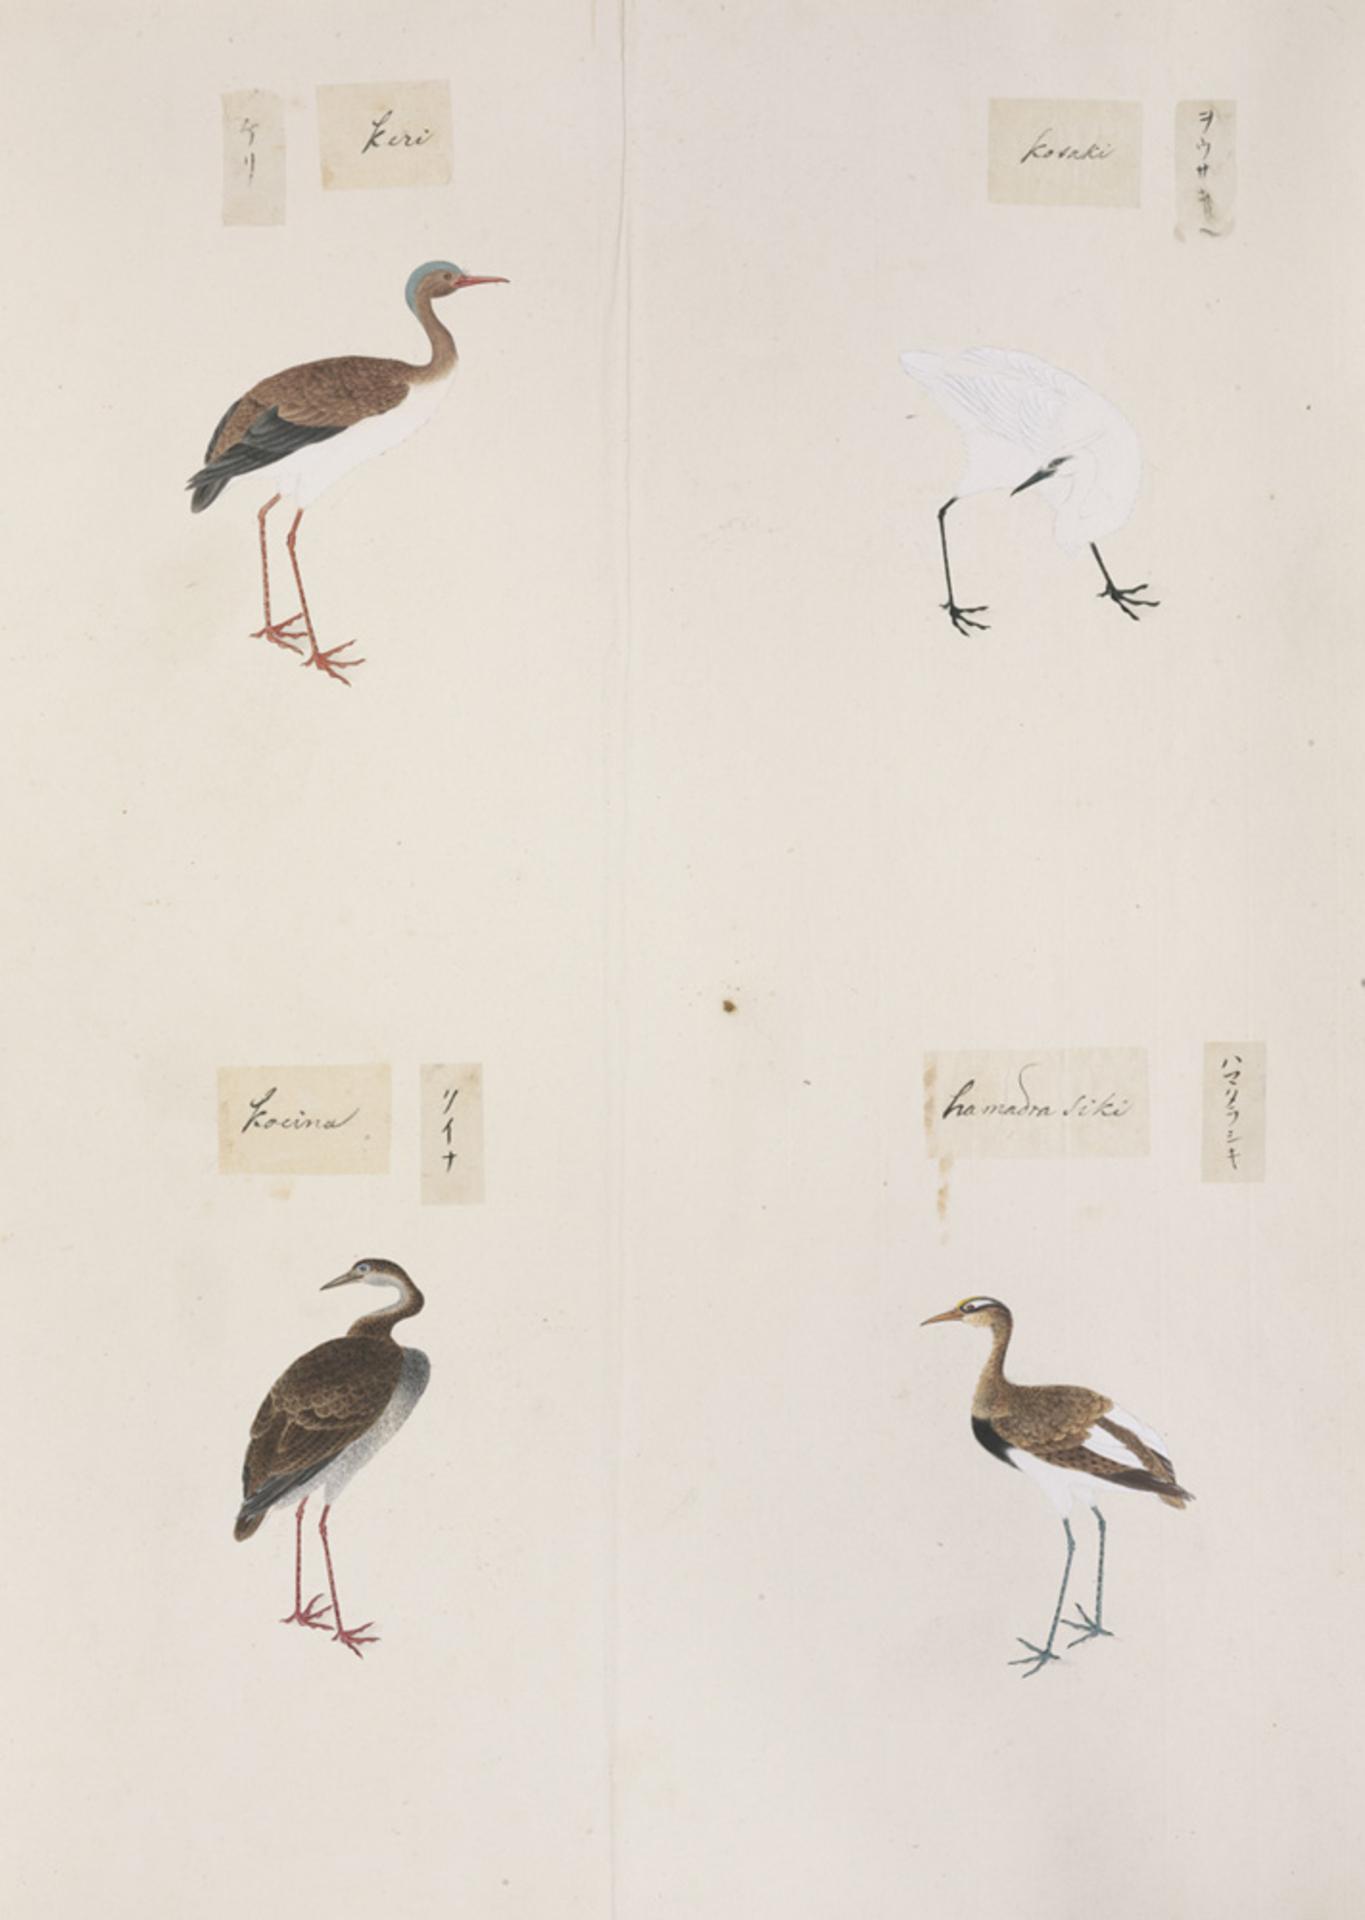 RMNH.ART.306   Rallus aquaticus